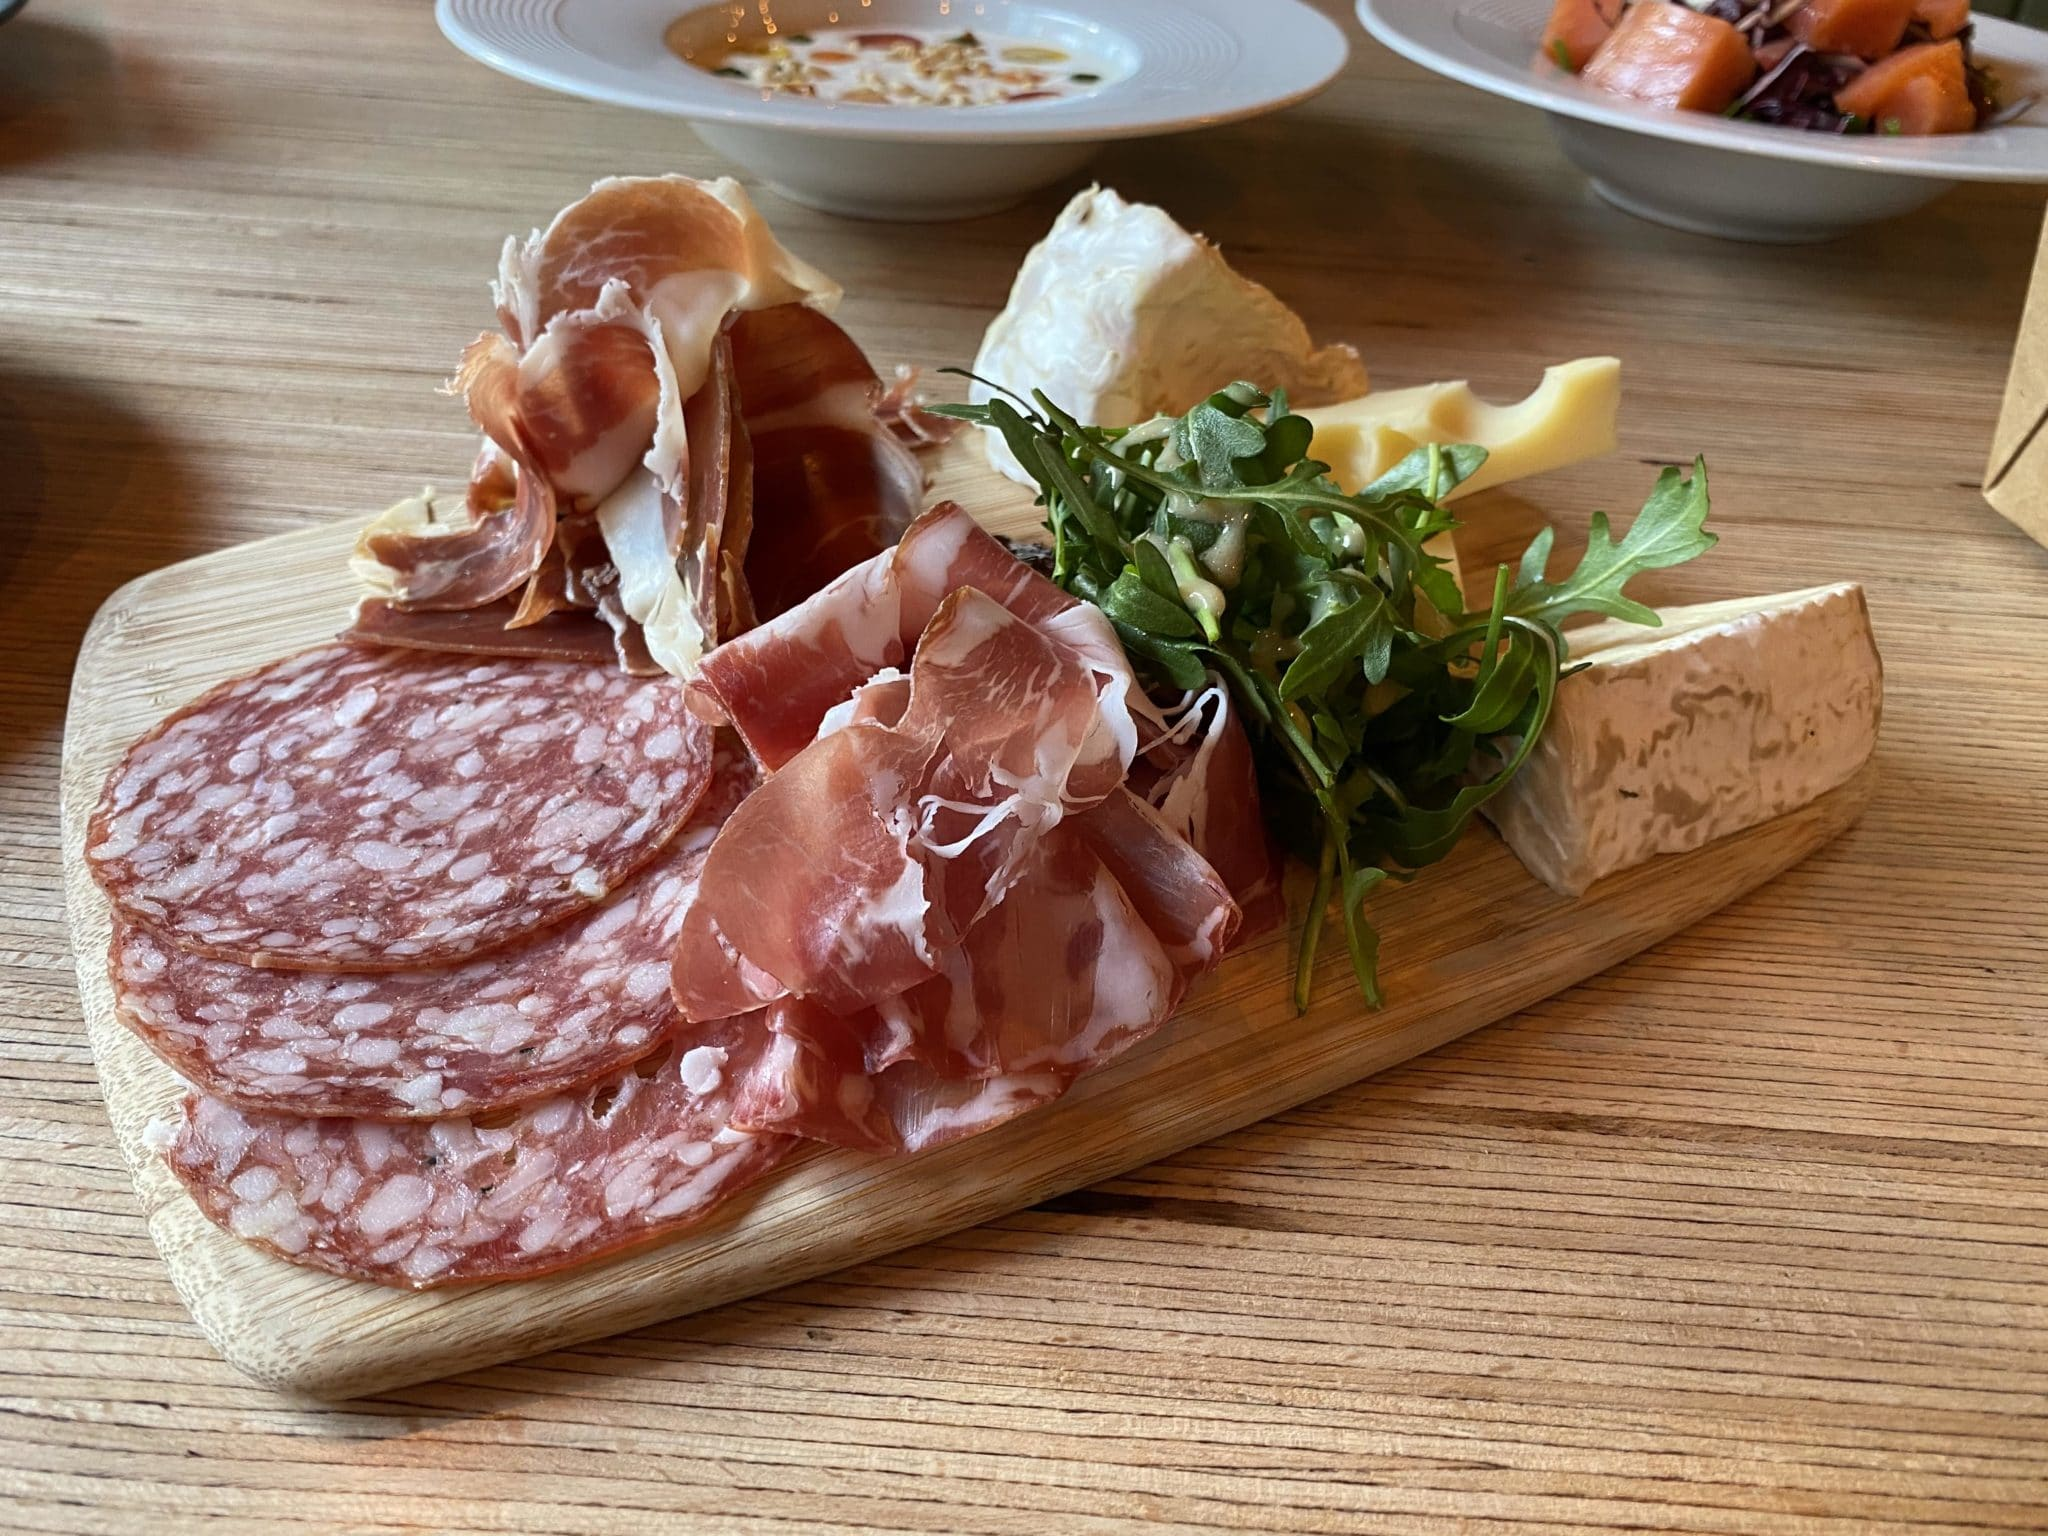 planche de charcuterie mixte - fromage - saucisson - salade - jambon de bayonne - produits frais - Vertical'Art Pigalle salle d'escalade restaurant bar